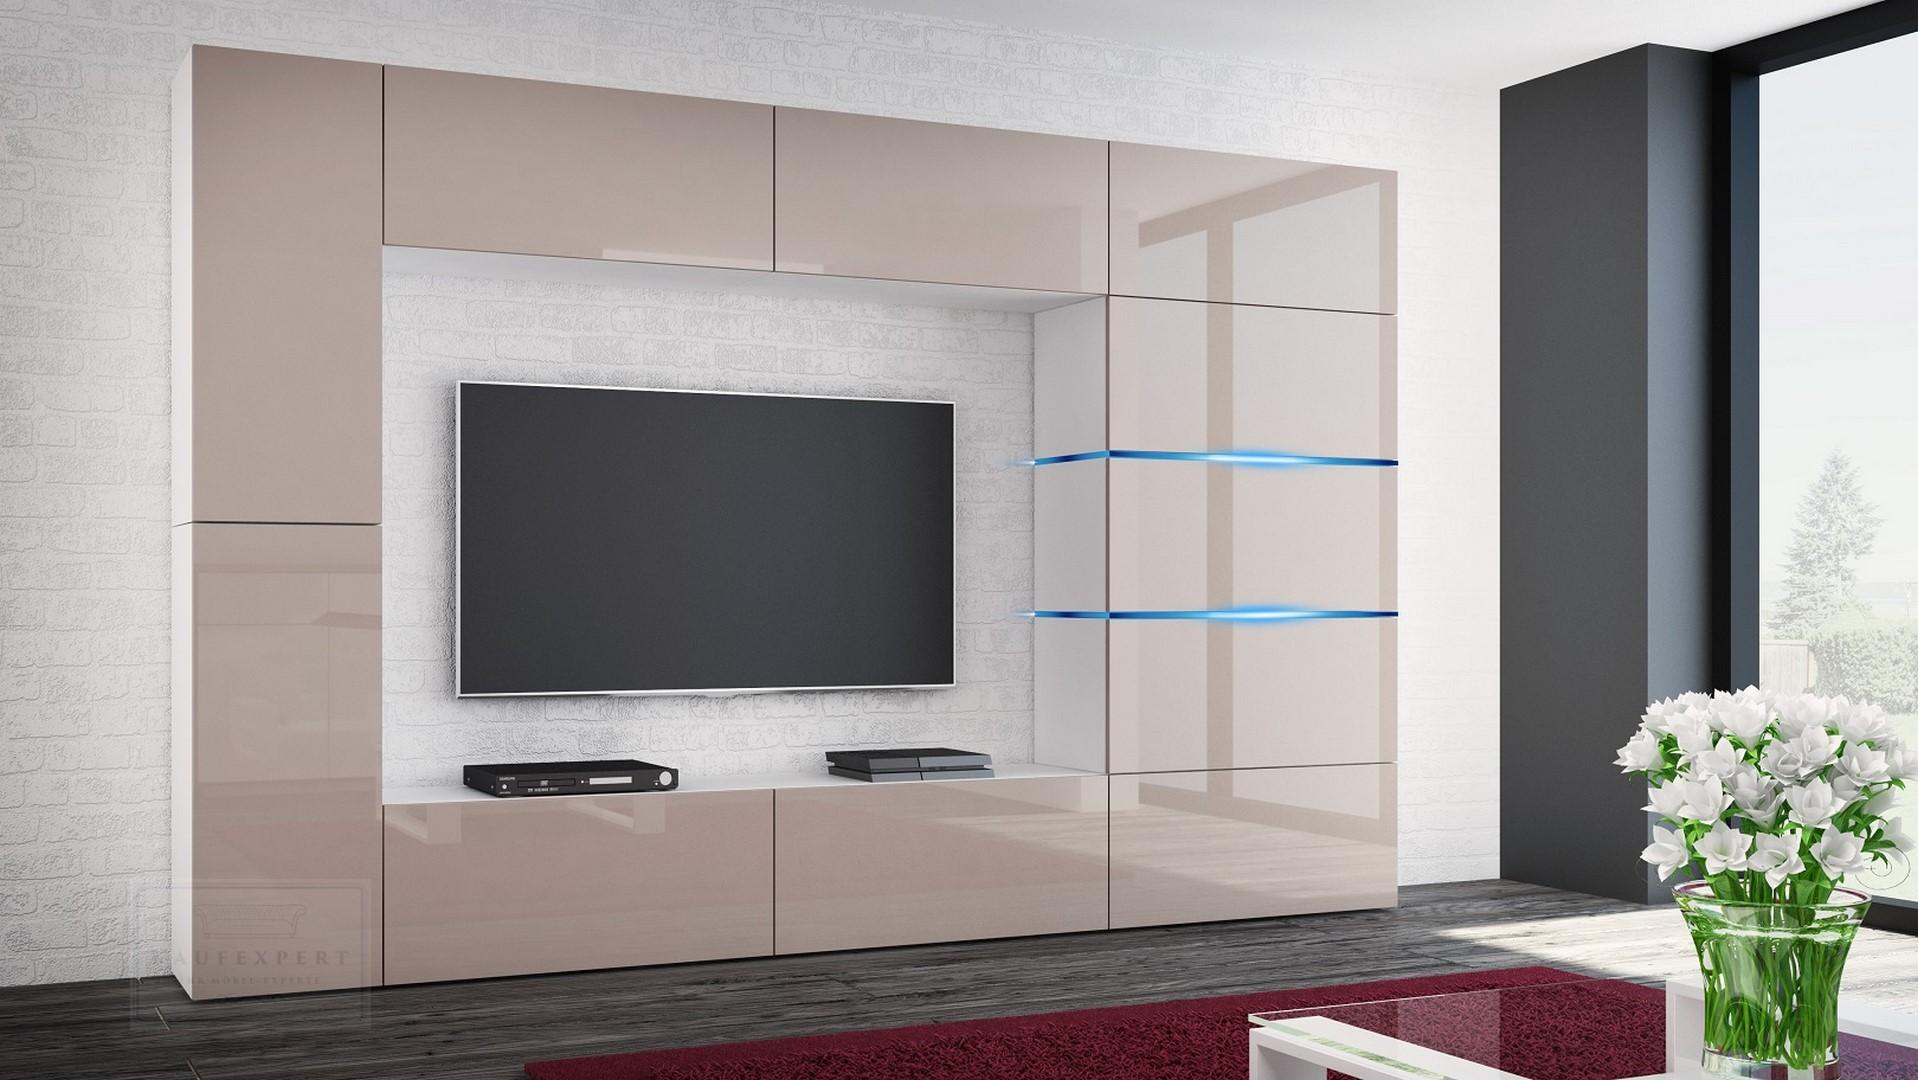 Wohnwand Shadow Cappuccino Hochglanz/Weiß 285 Cm Mediawand Anbauwand  Medienwand Design Modern Led Beleuchtung MDF